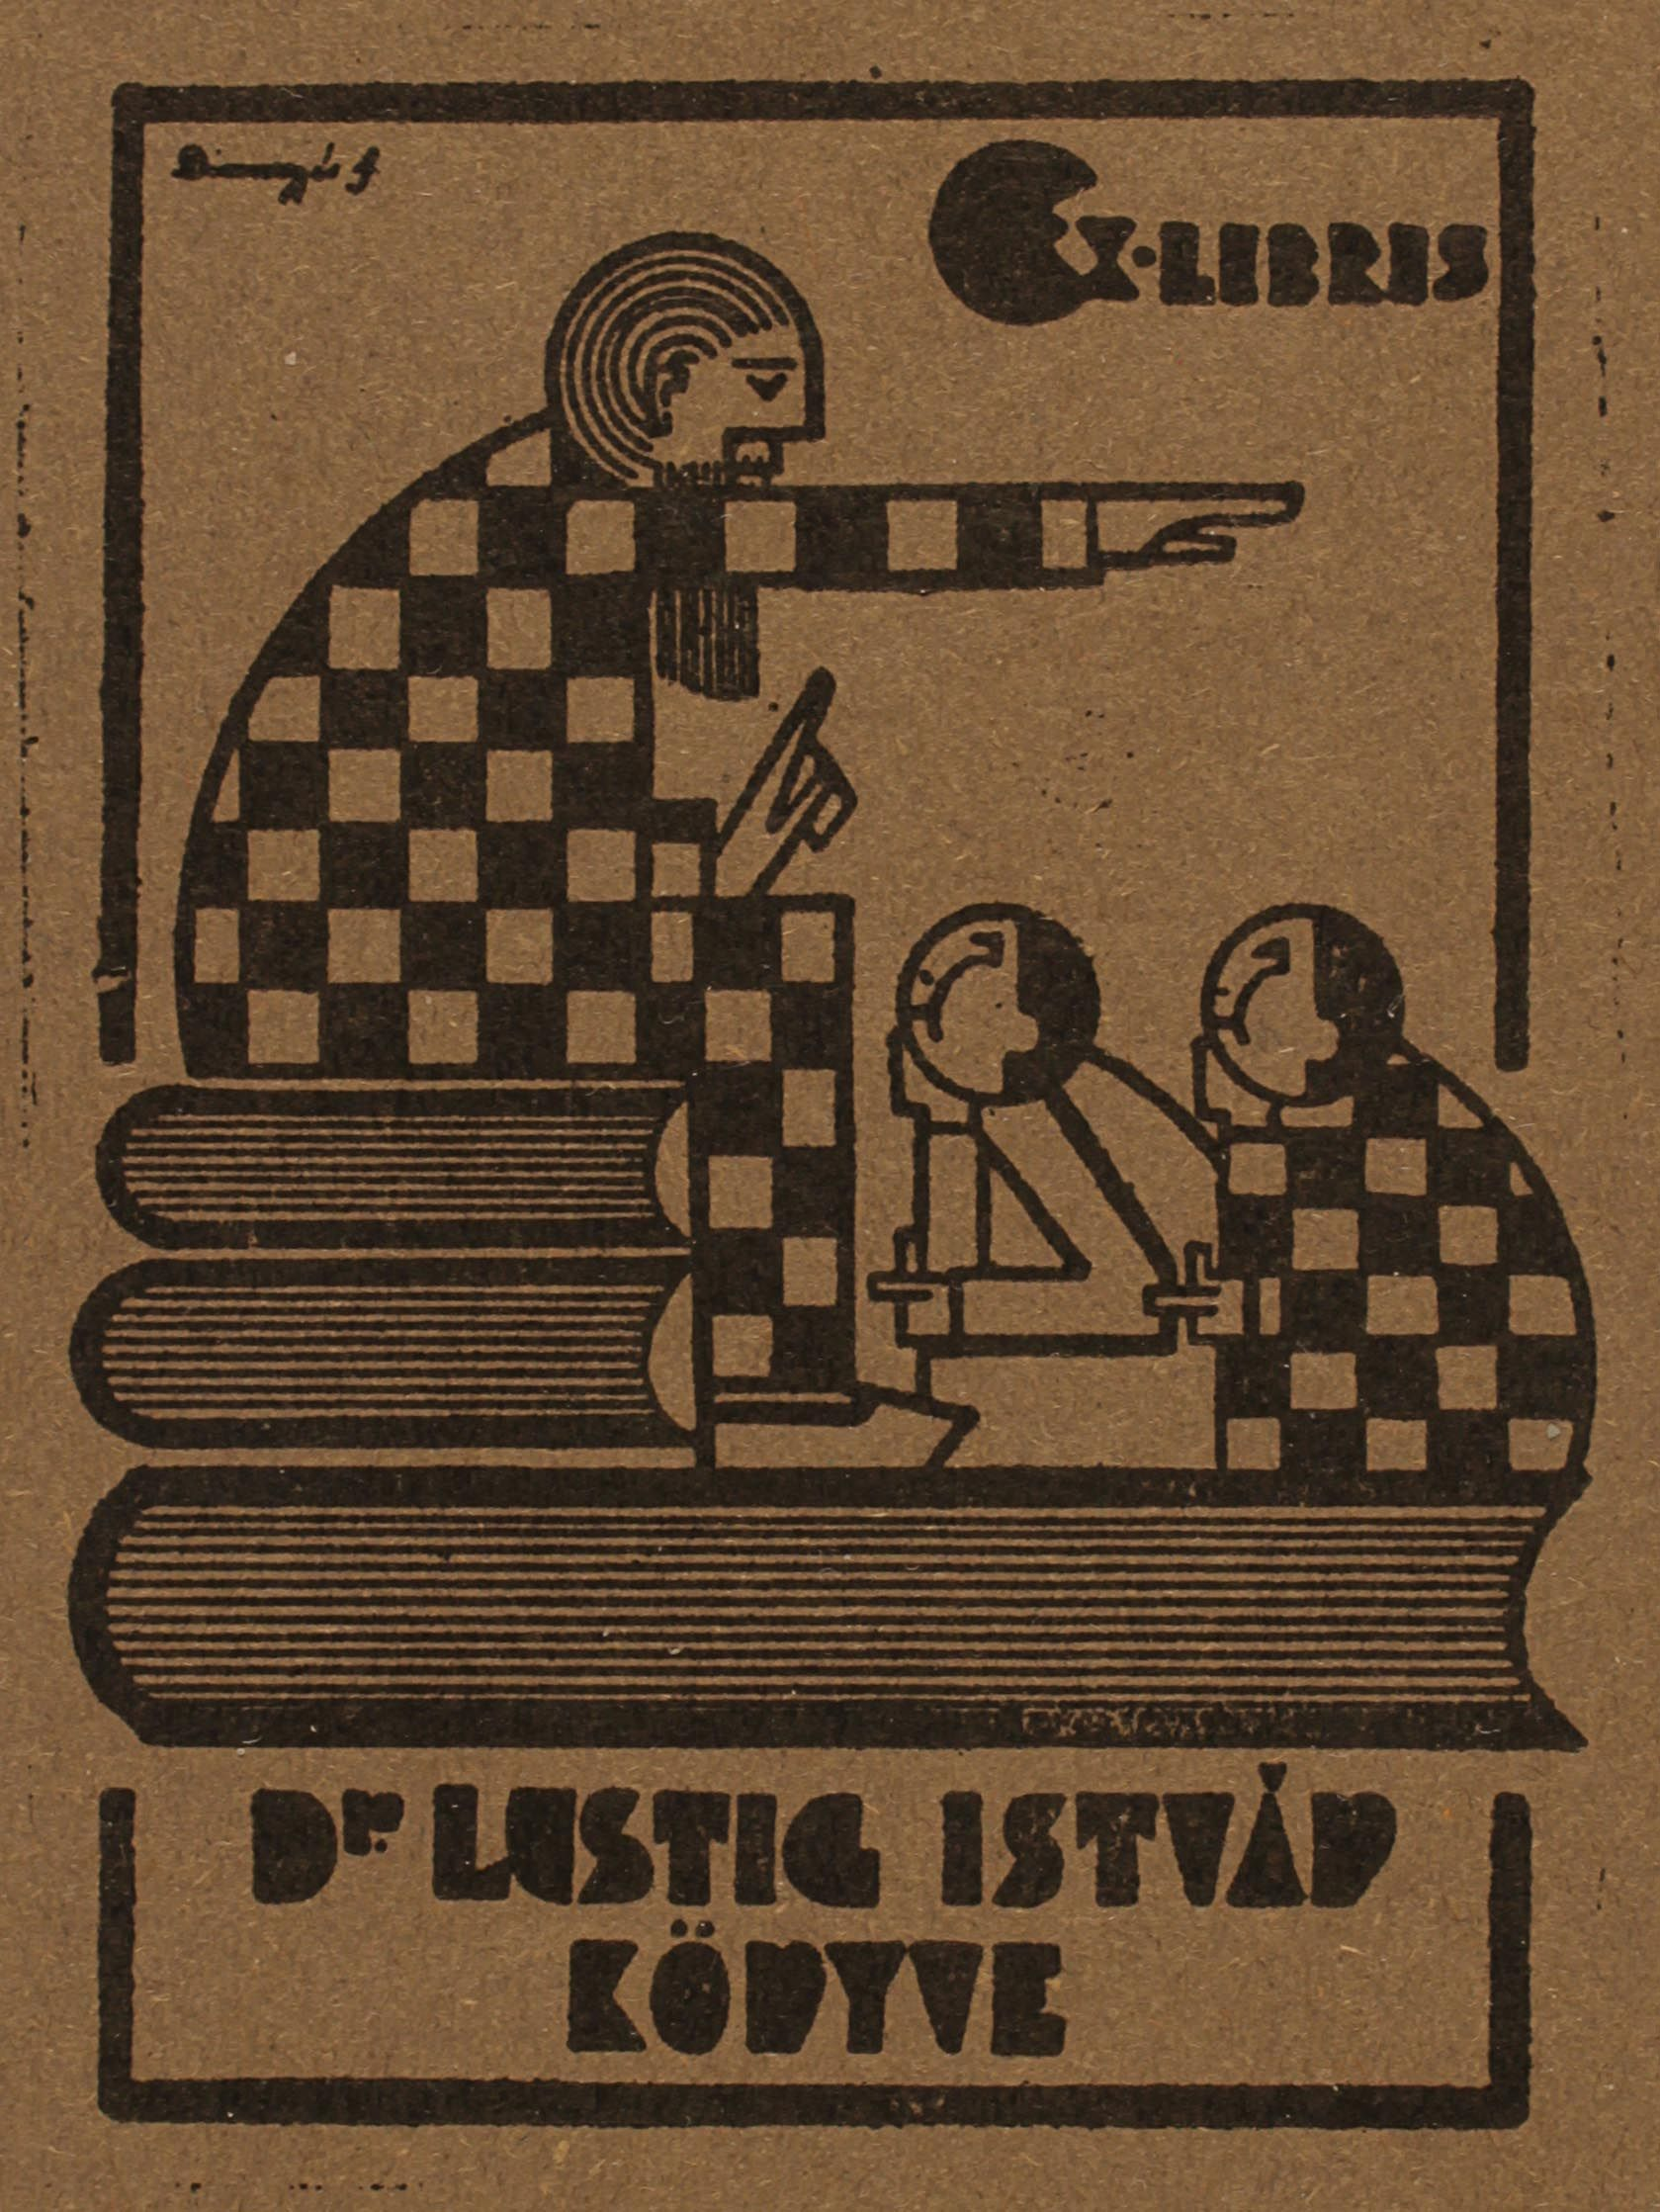 Ferenc Dinnyes, Art-exlibris.net